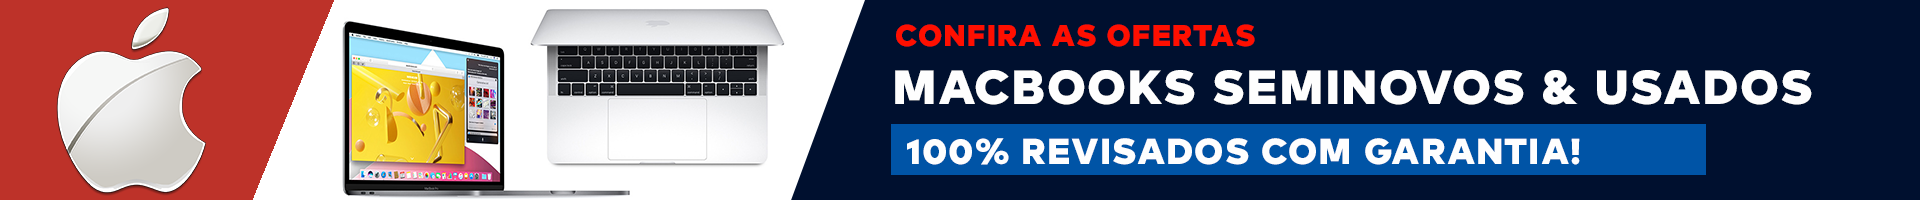 catalogo-macbook